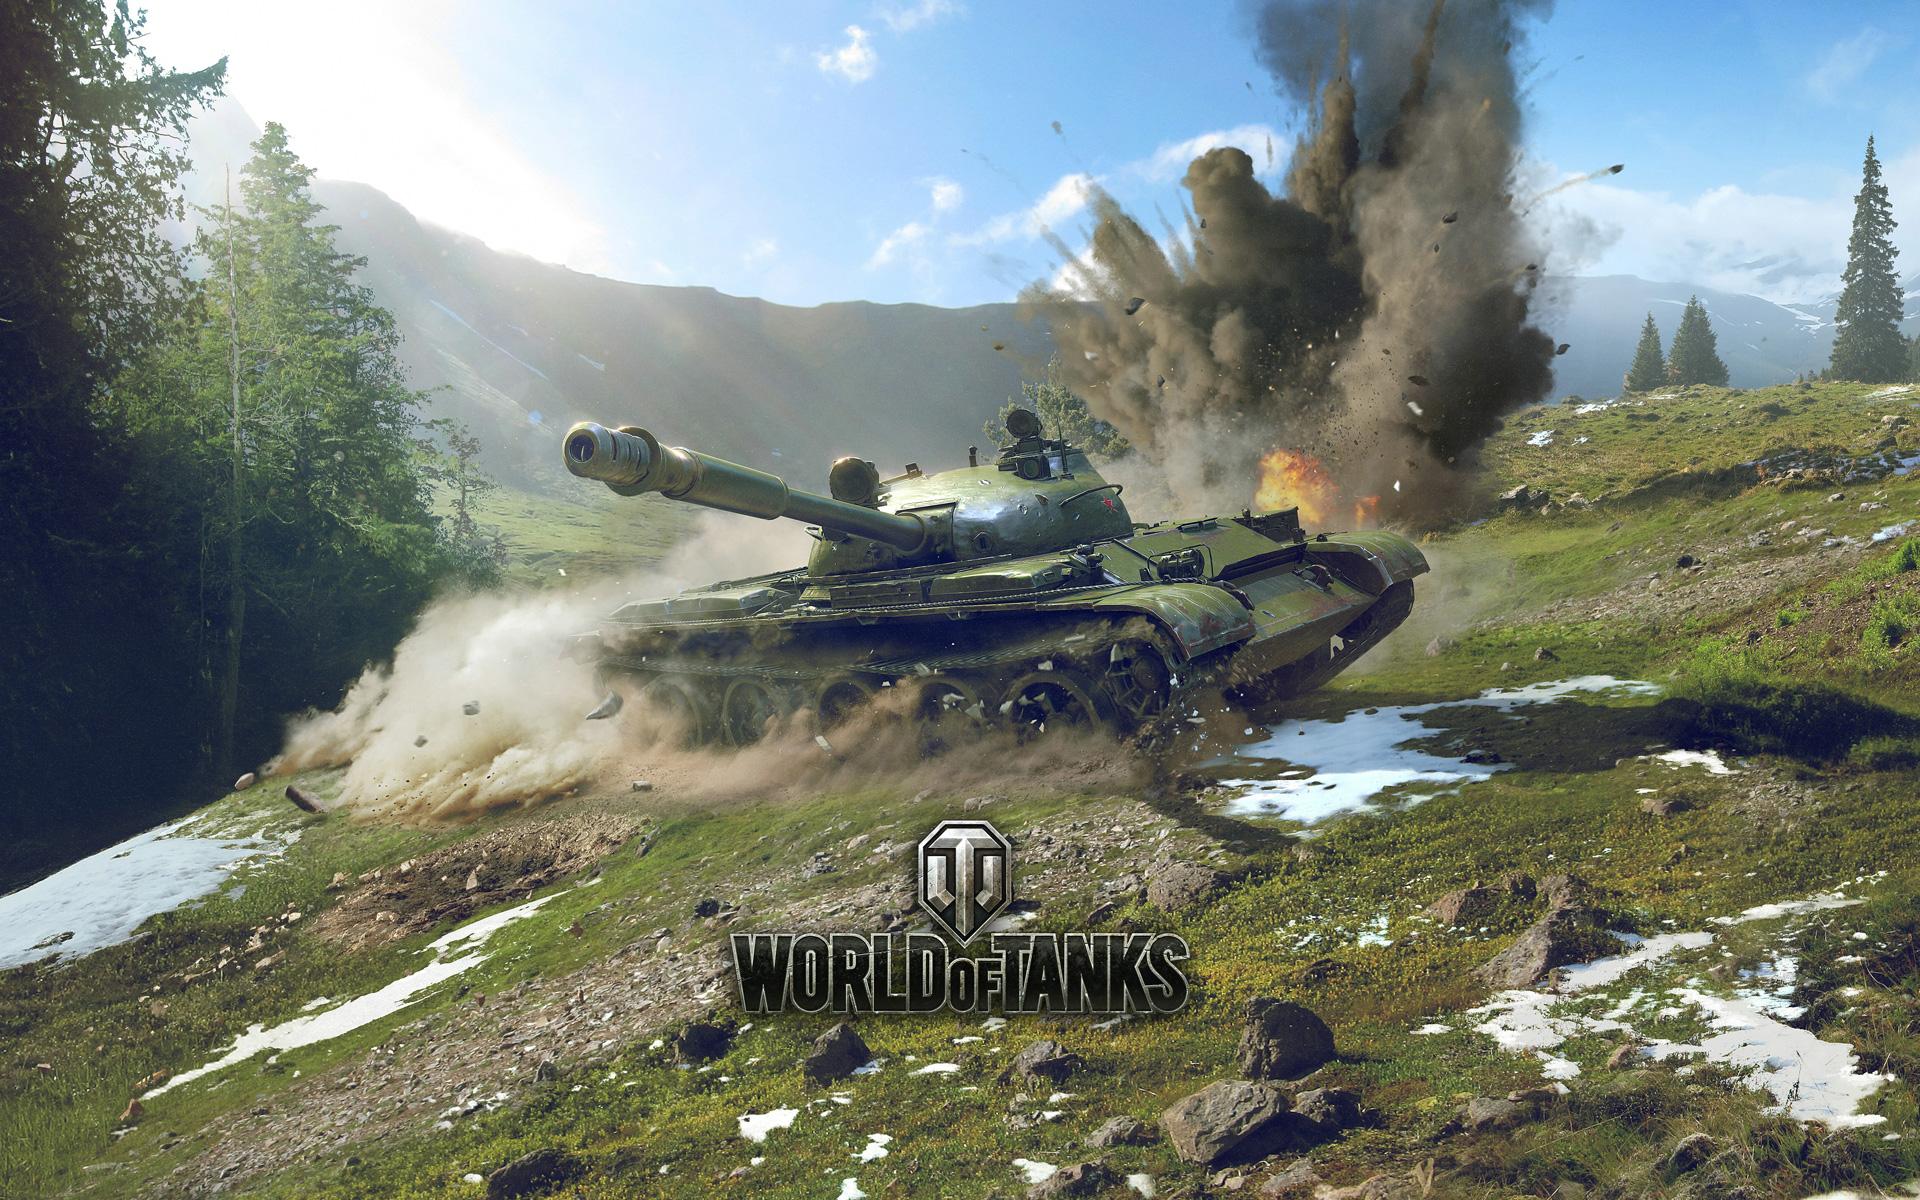 Free World of Tanks Wallpaper in 1920x1200